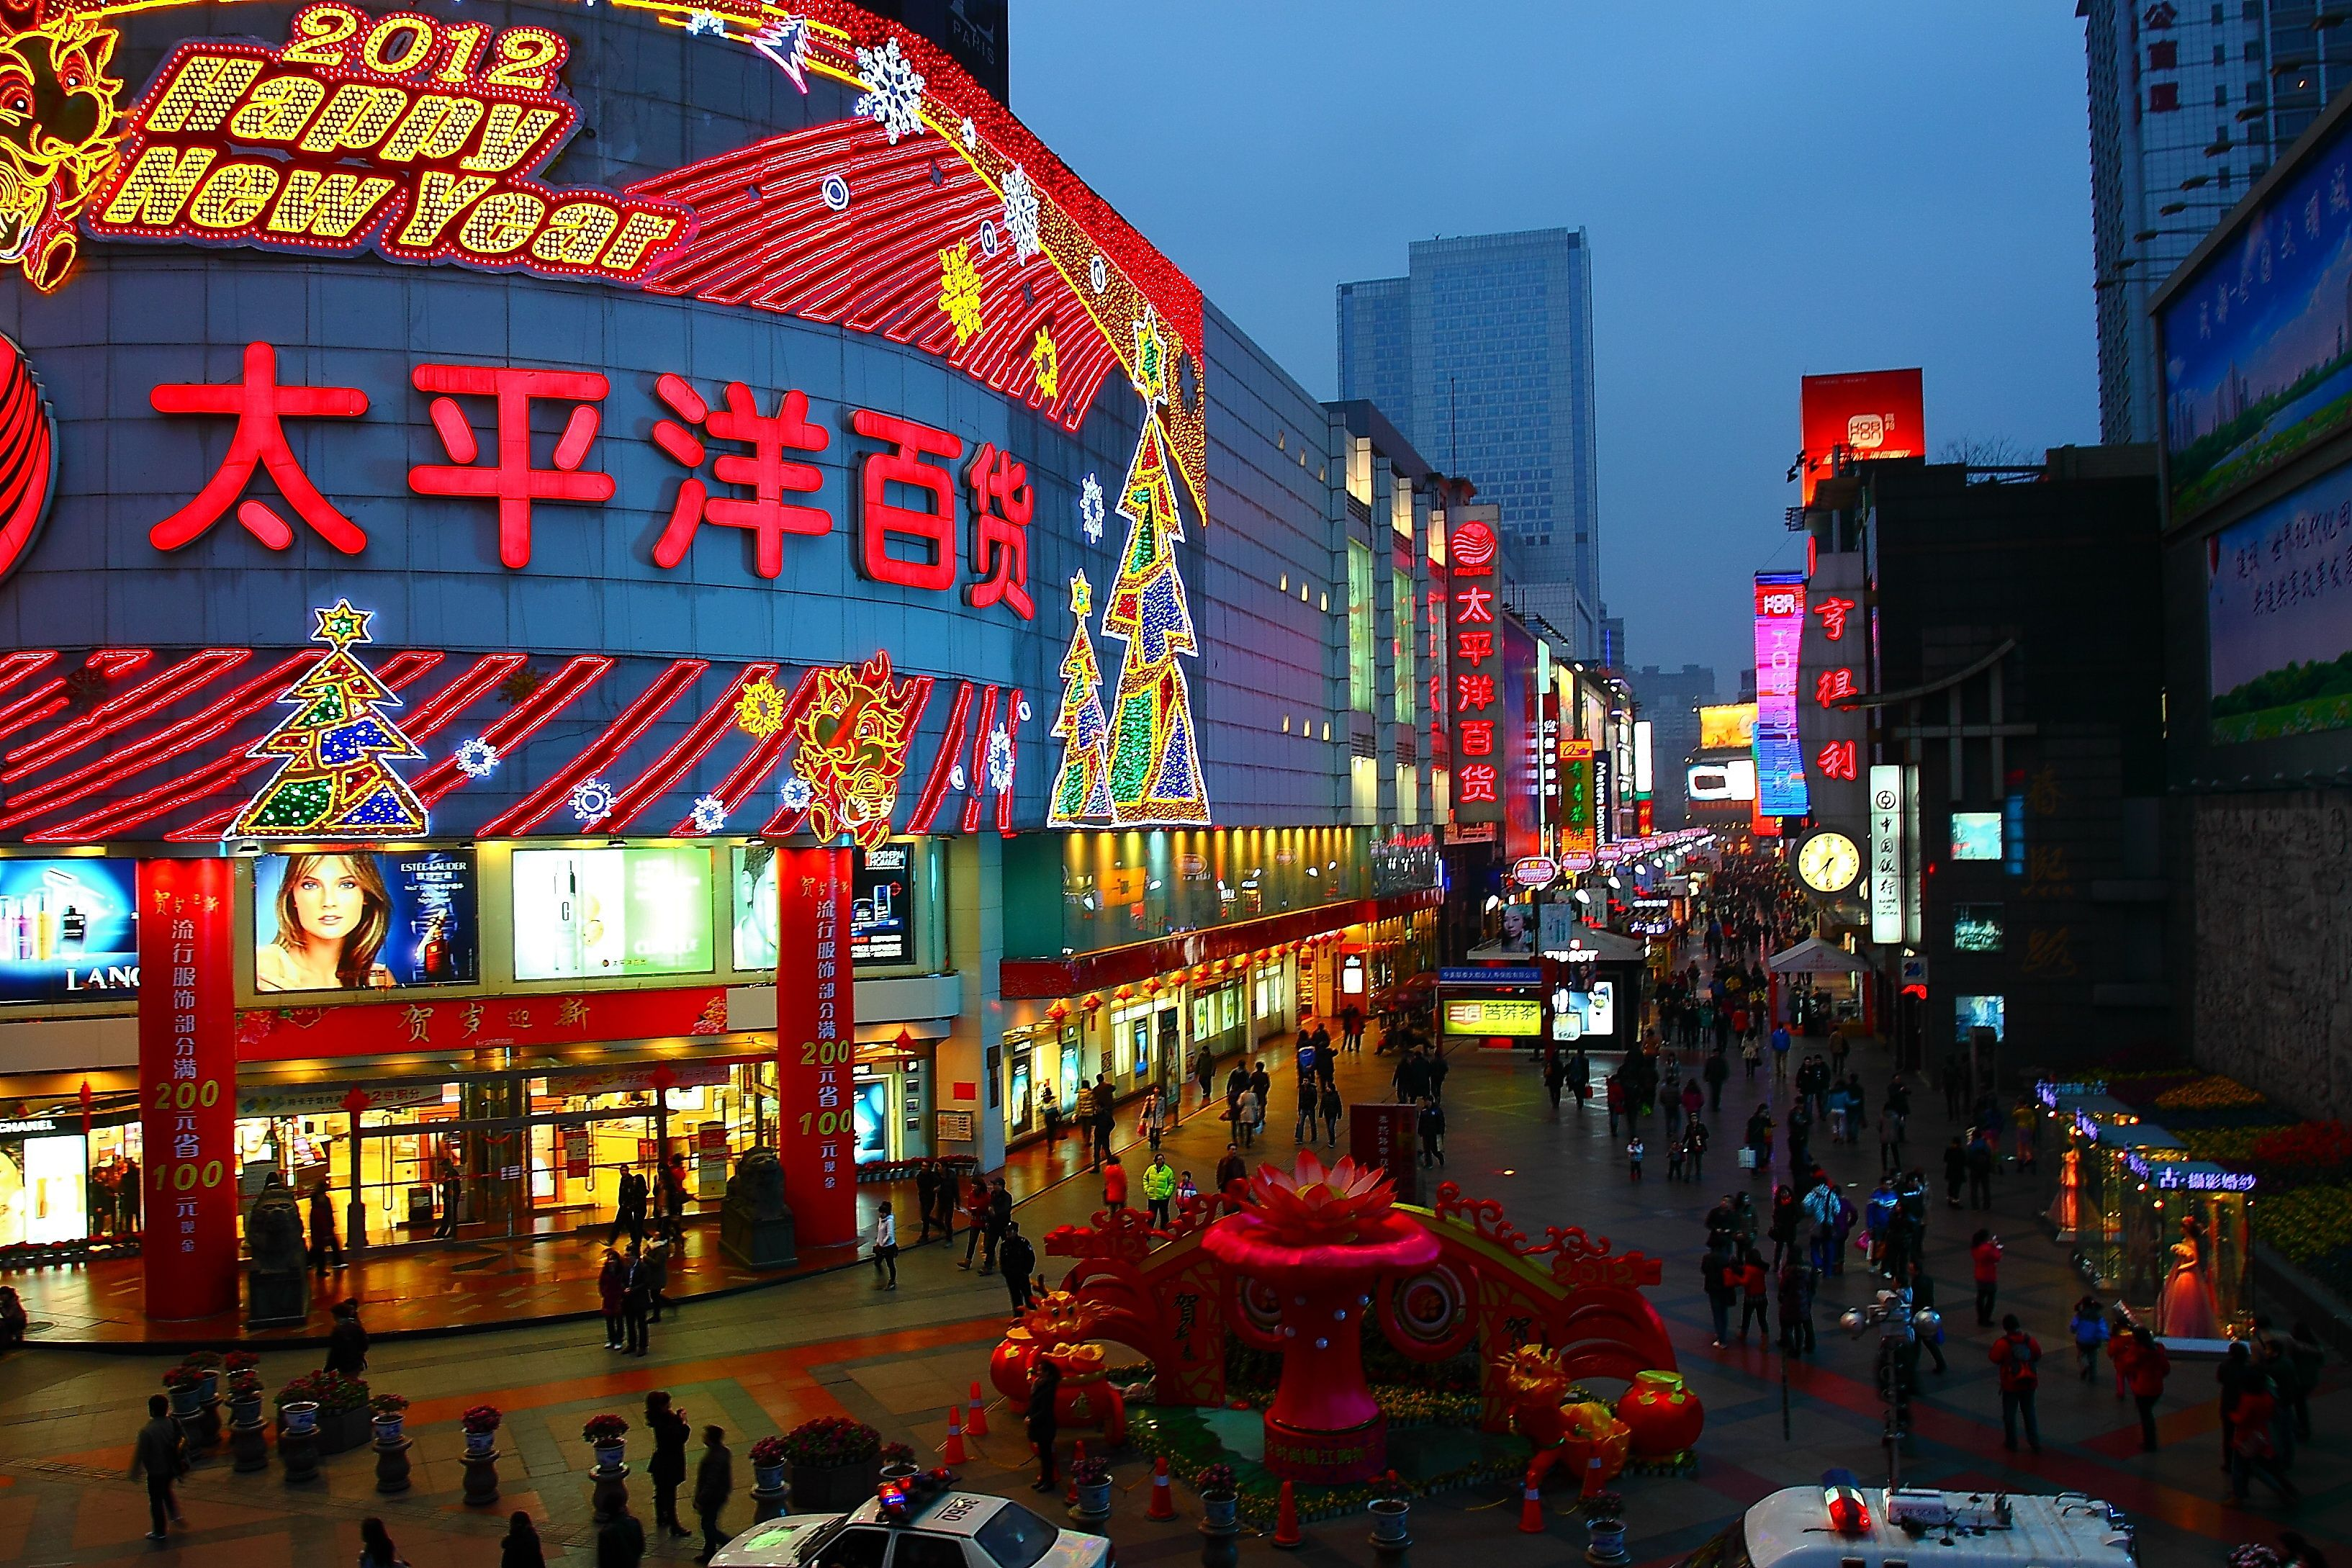 chunxi road chengdu - Google Search